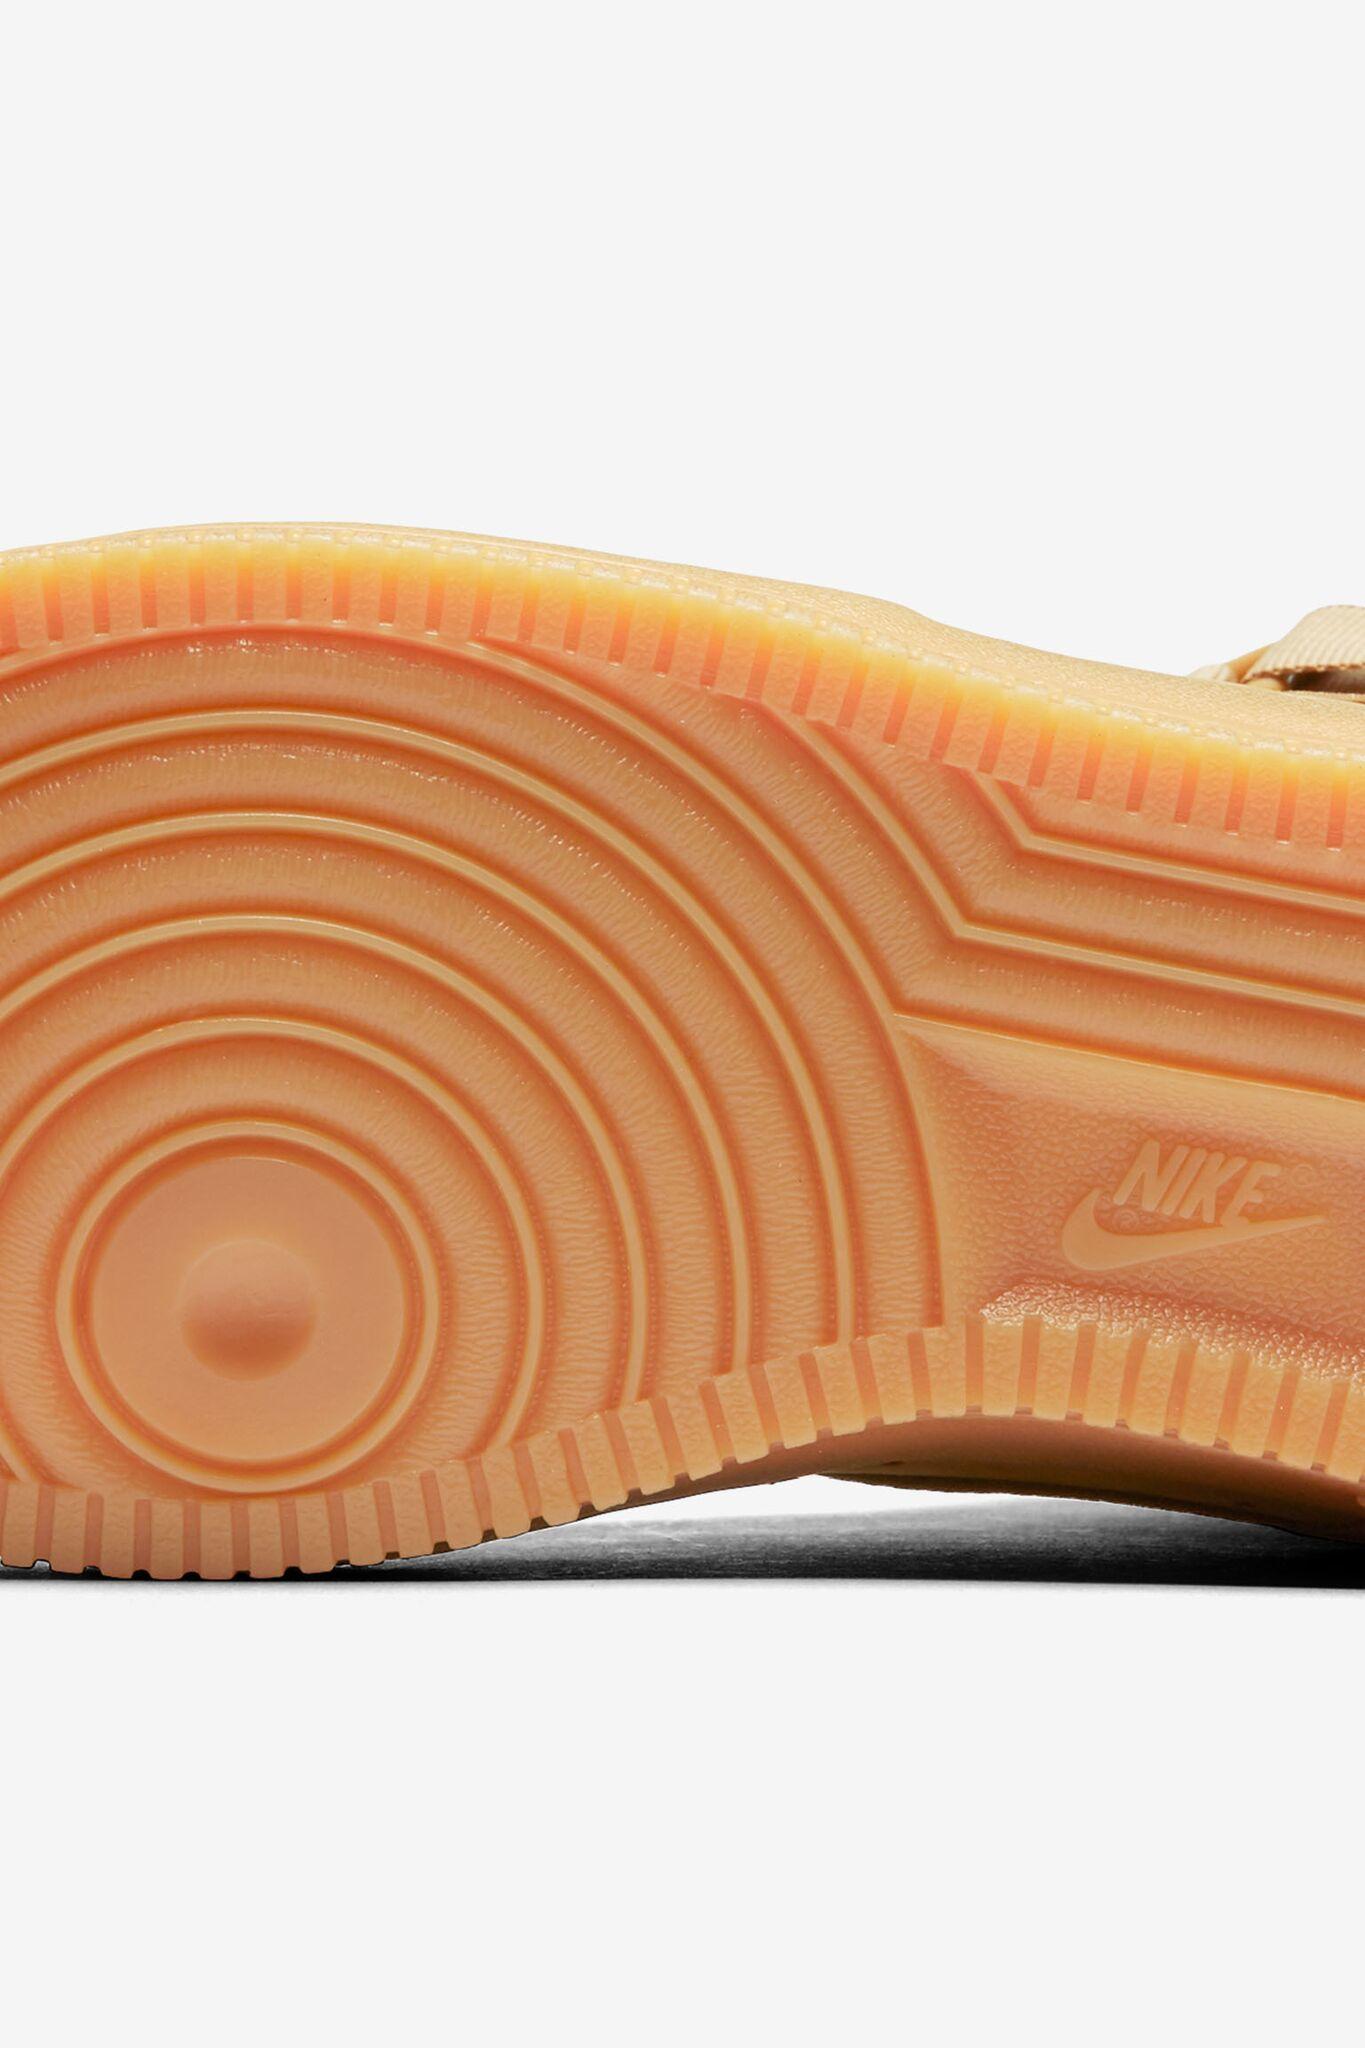 Nike Air Force 1 High 'Flax' til kvinder